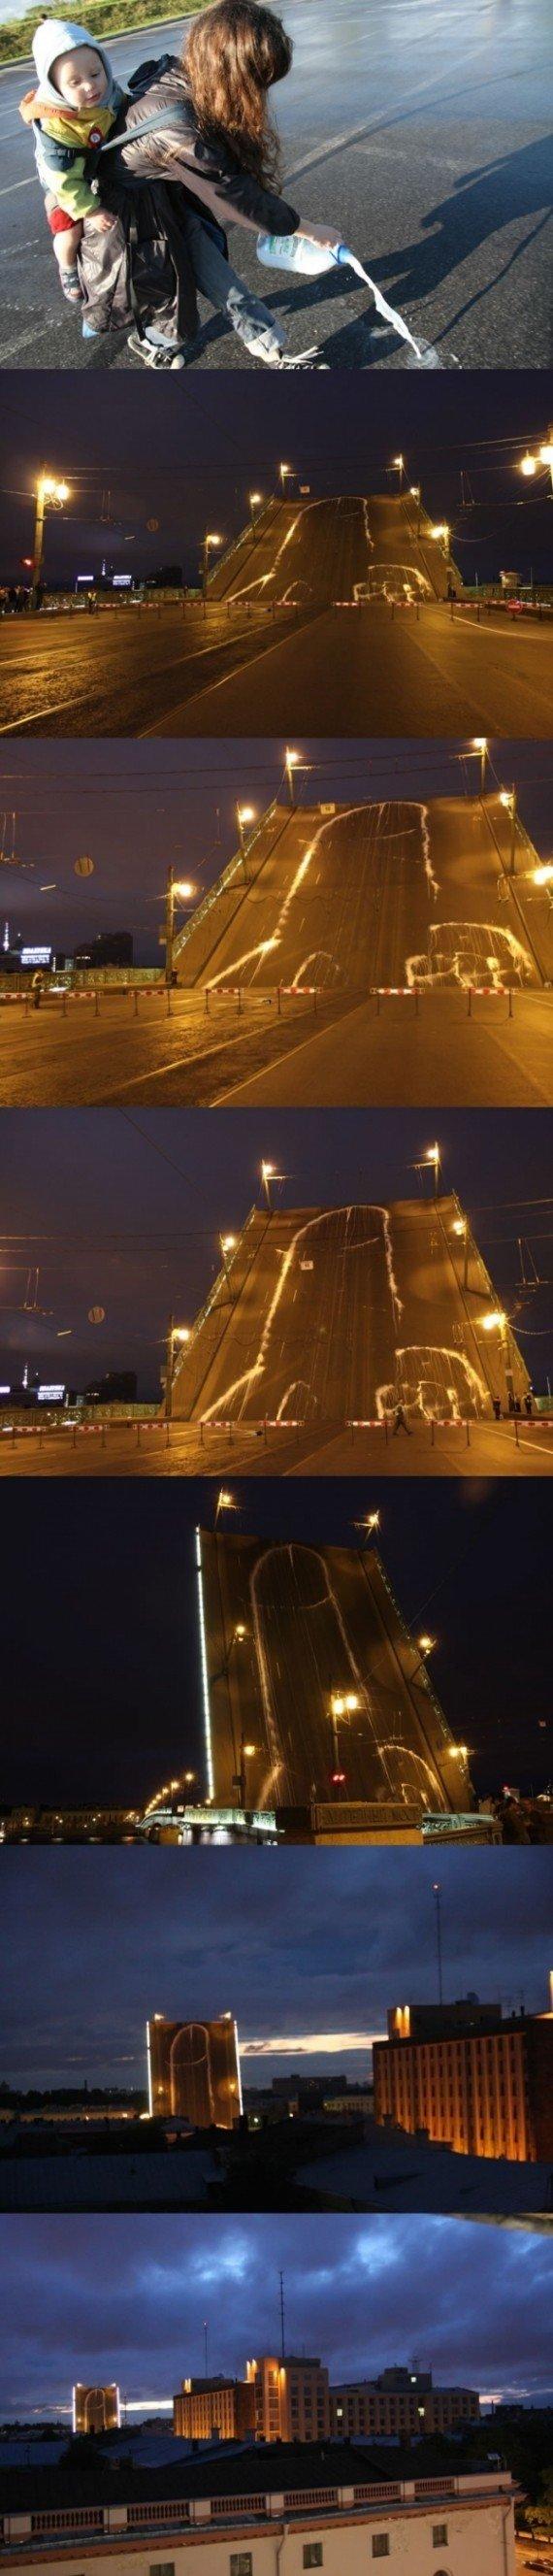 The Penis Rises. .. The security guard when the bridge rises. nhk